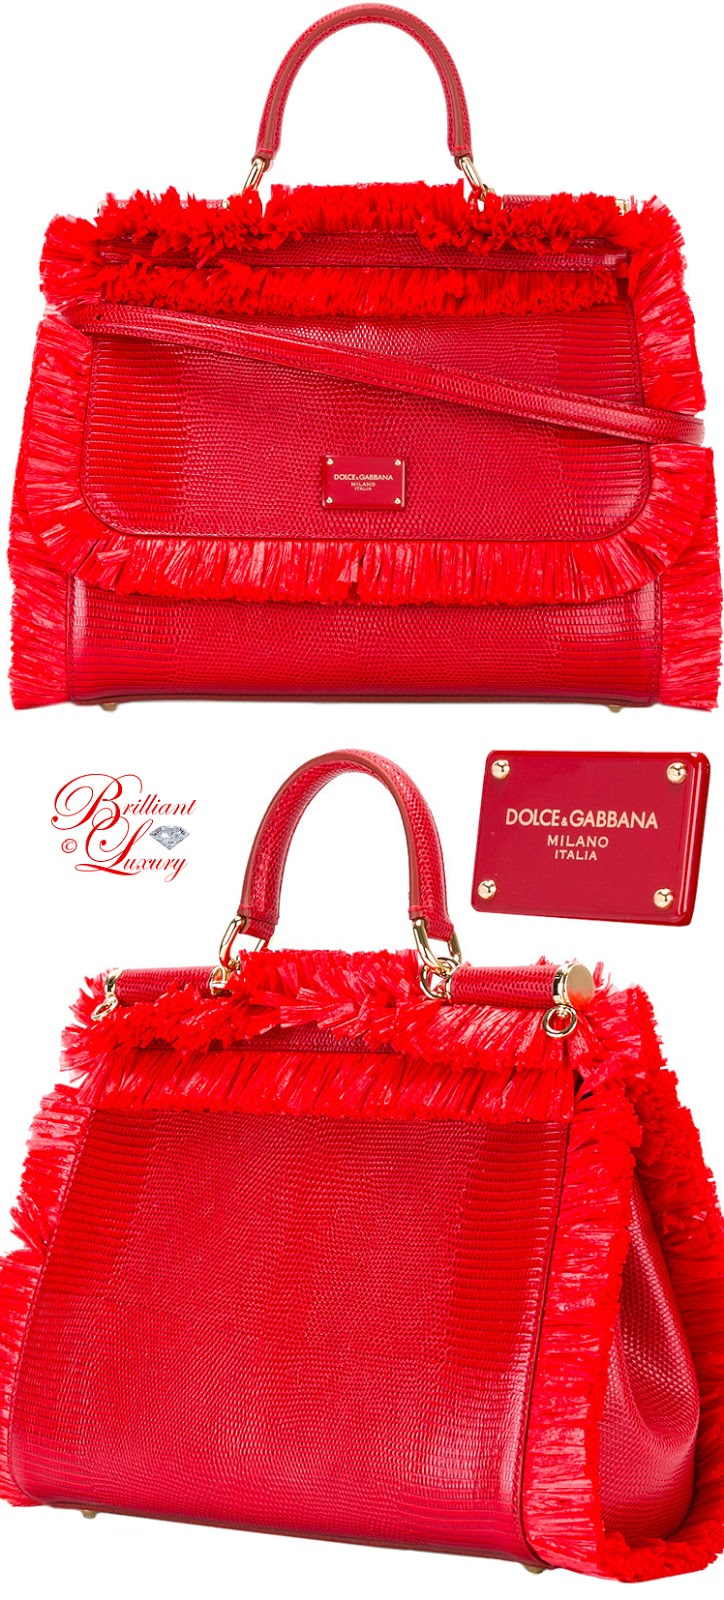 Brilliant Luxury ♦ Dolce & Gabbana Fringed Detail Handbag